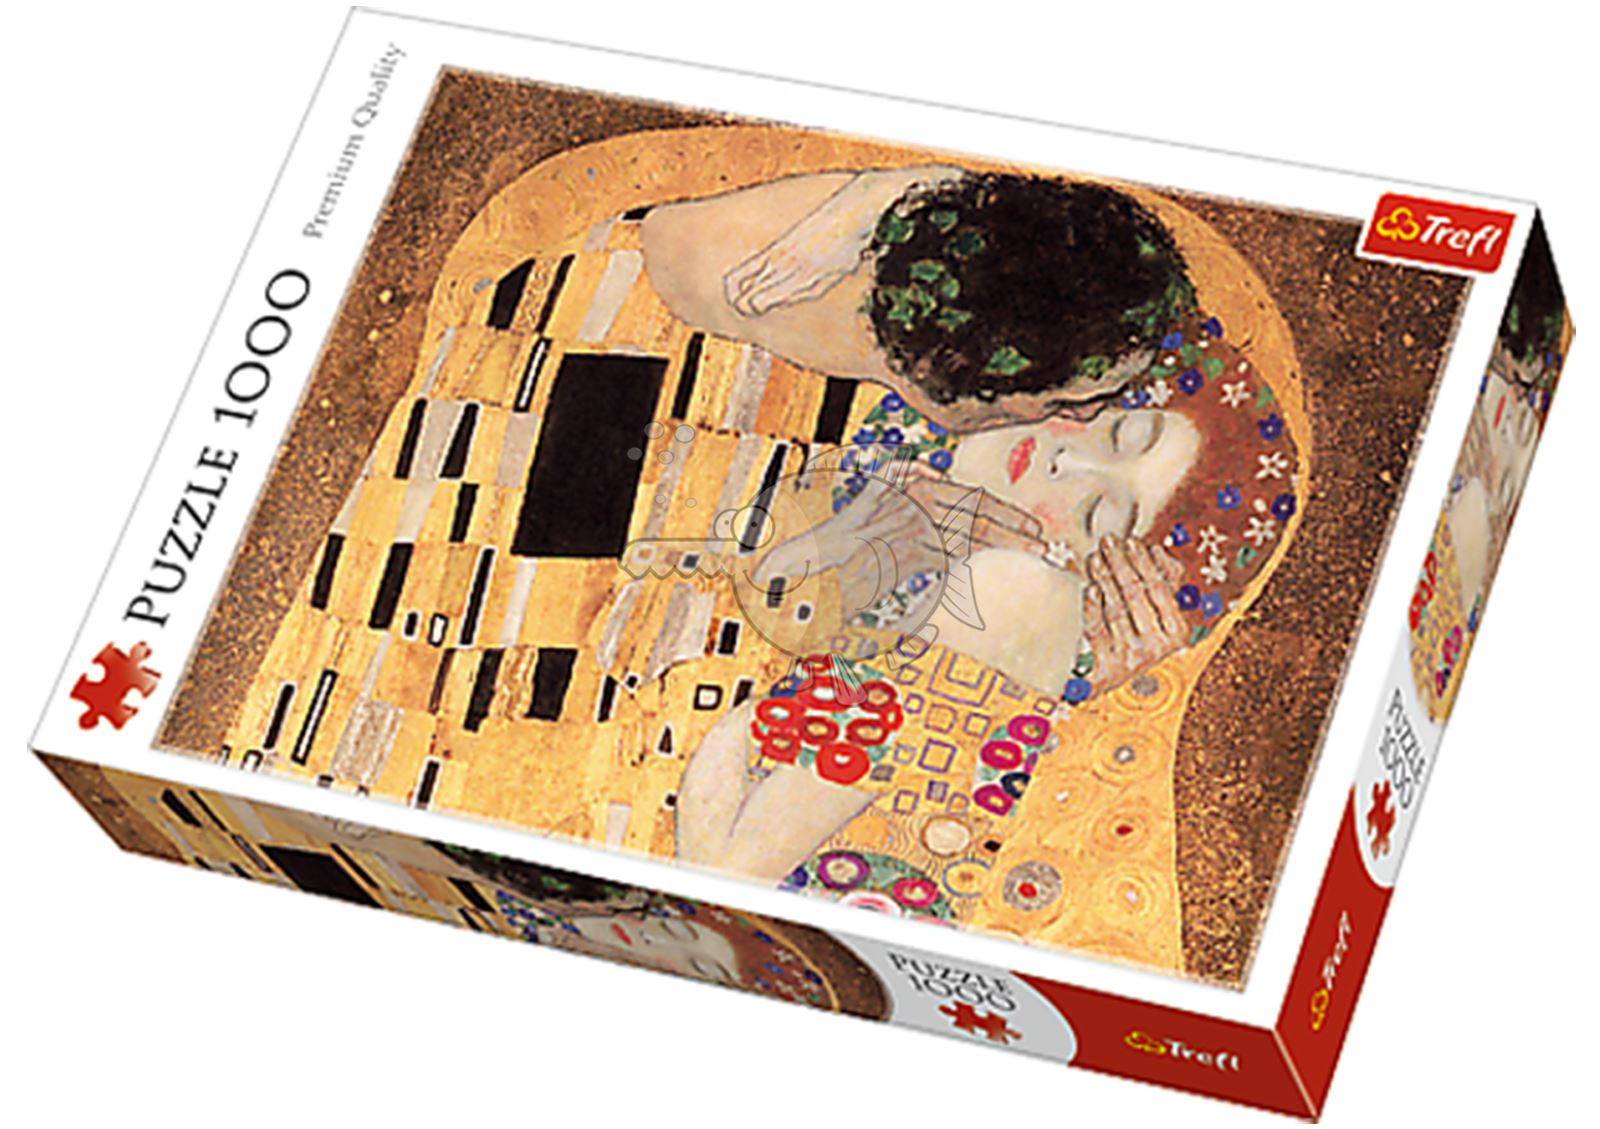 Trefl-300-500-1000-1500-2000-3000-4000-6000-Piece-Jigsaw-Puzzle-Landscapes-City thumbnail 392